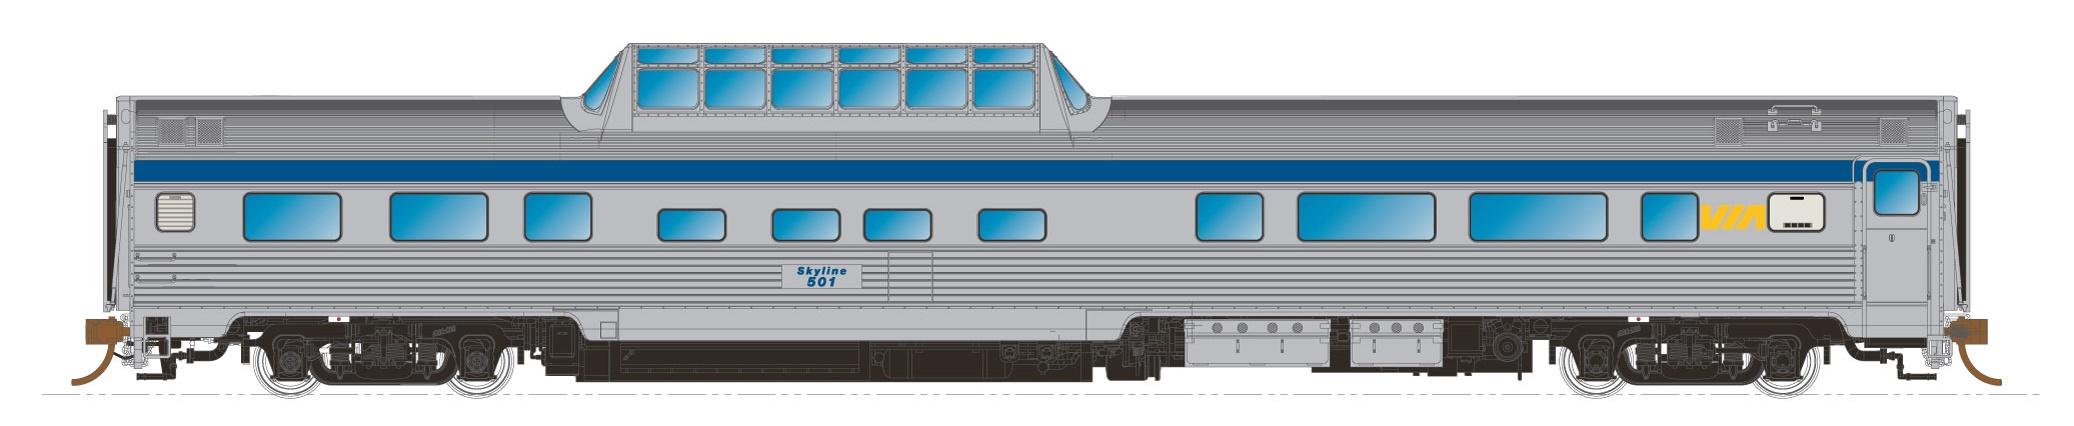 N Scale - Rapido Trains - 550110 - Passenger Car, Budd, Cafe-Bar-Lounge - Via Rail Canada